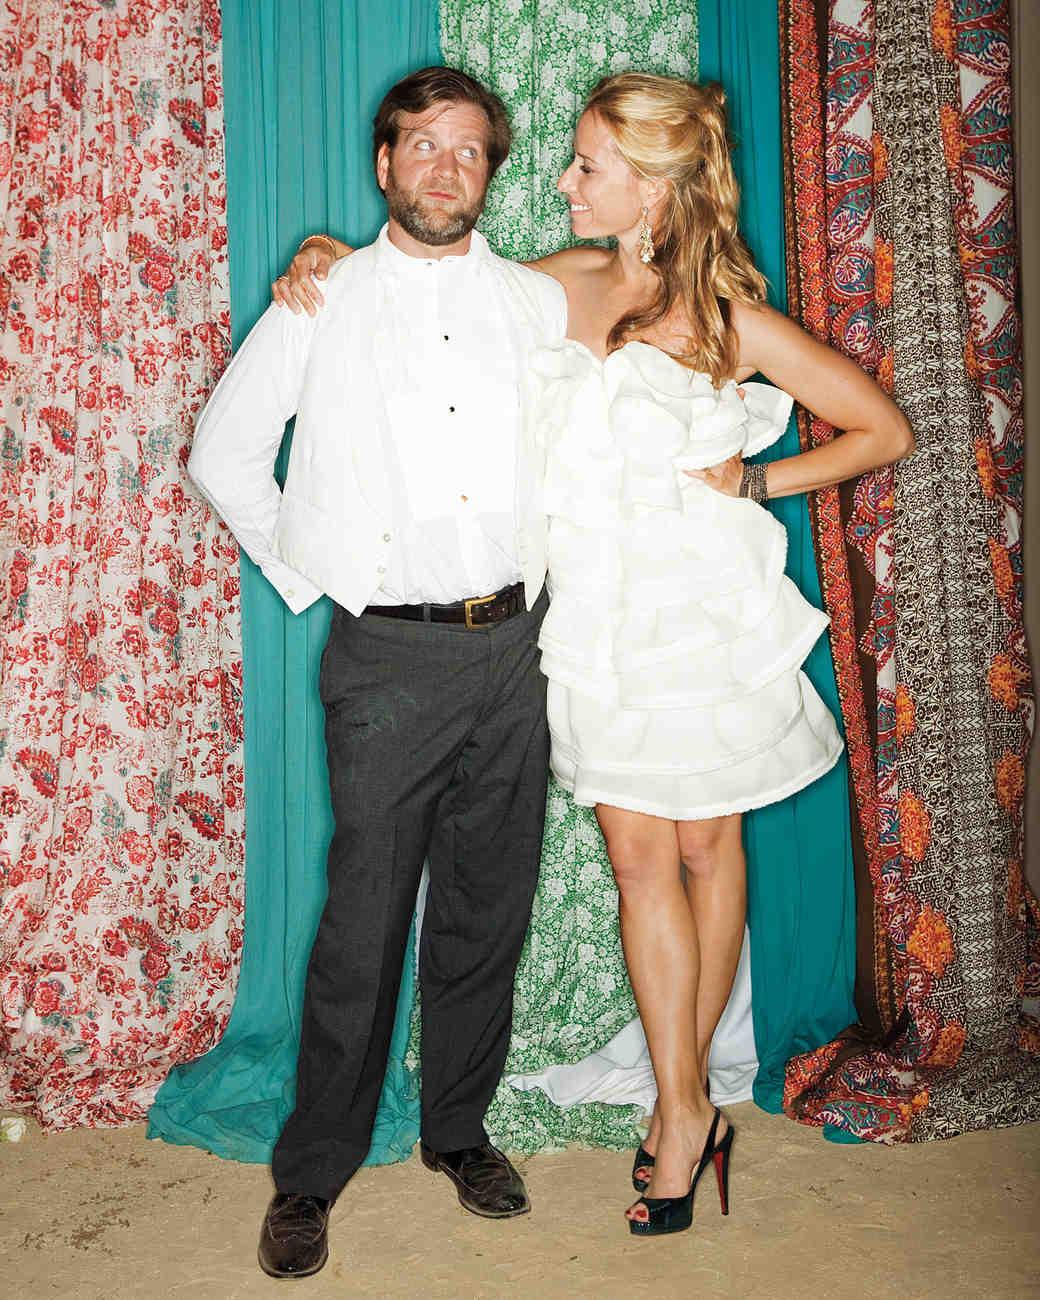 Bride in Short Flouncy Wedding Dress